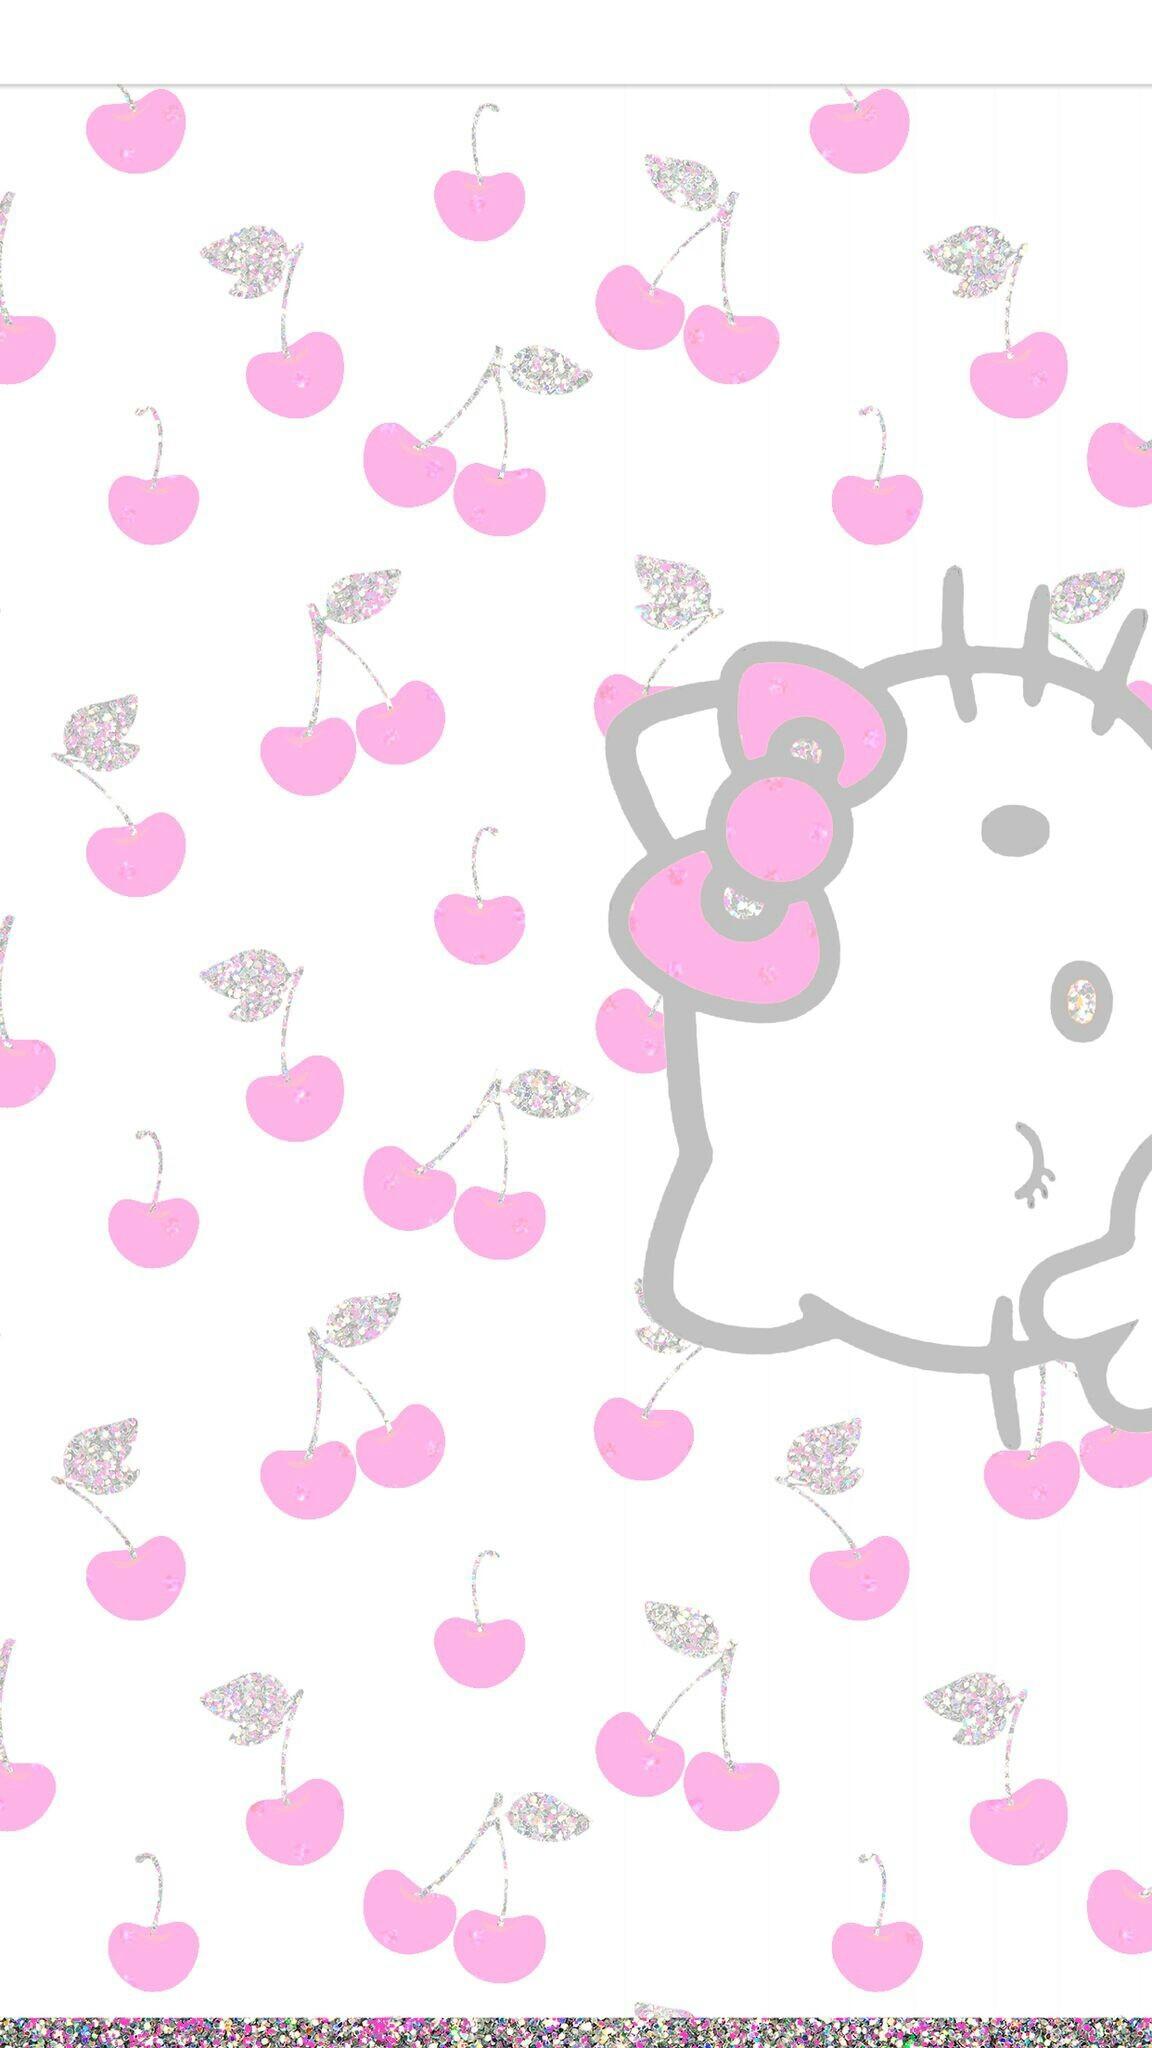 Wonderful Wallpaper Hello Kitty Home Screen - 346305  Photograph_783975.jpg